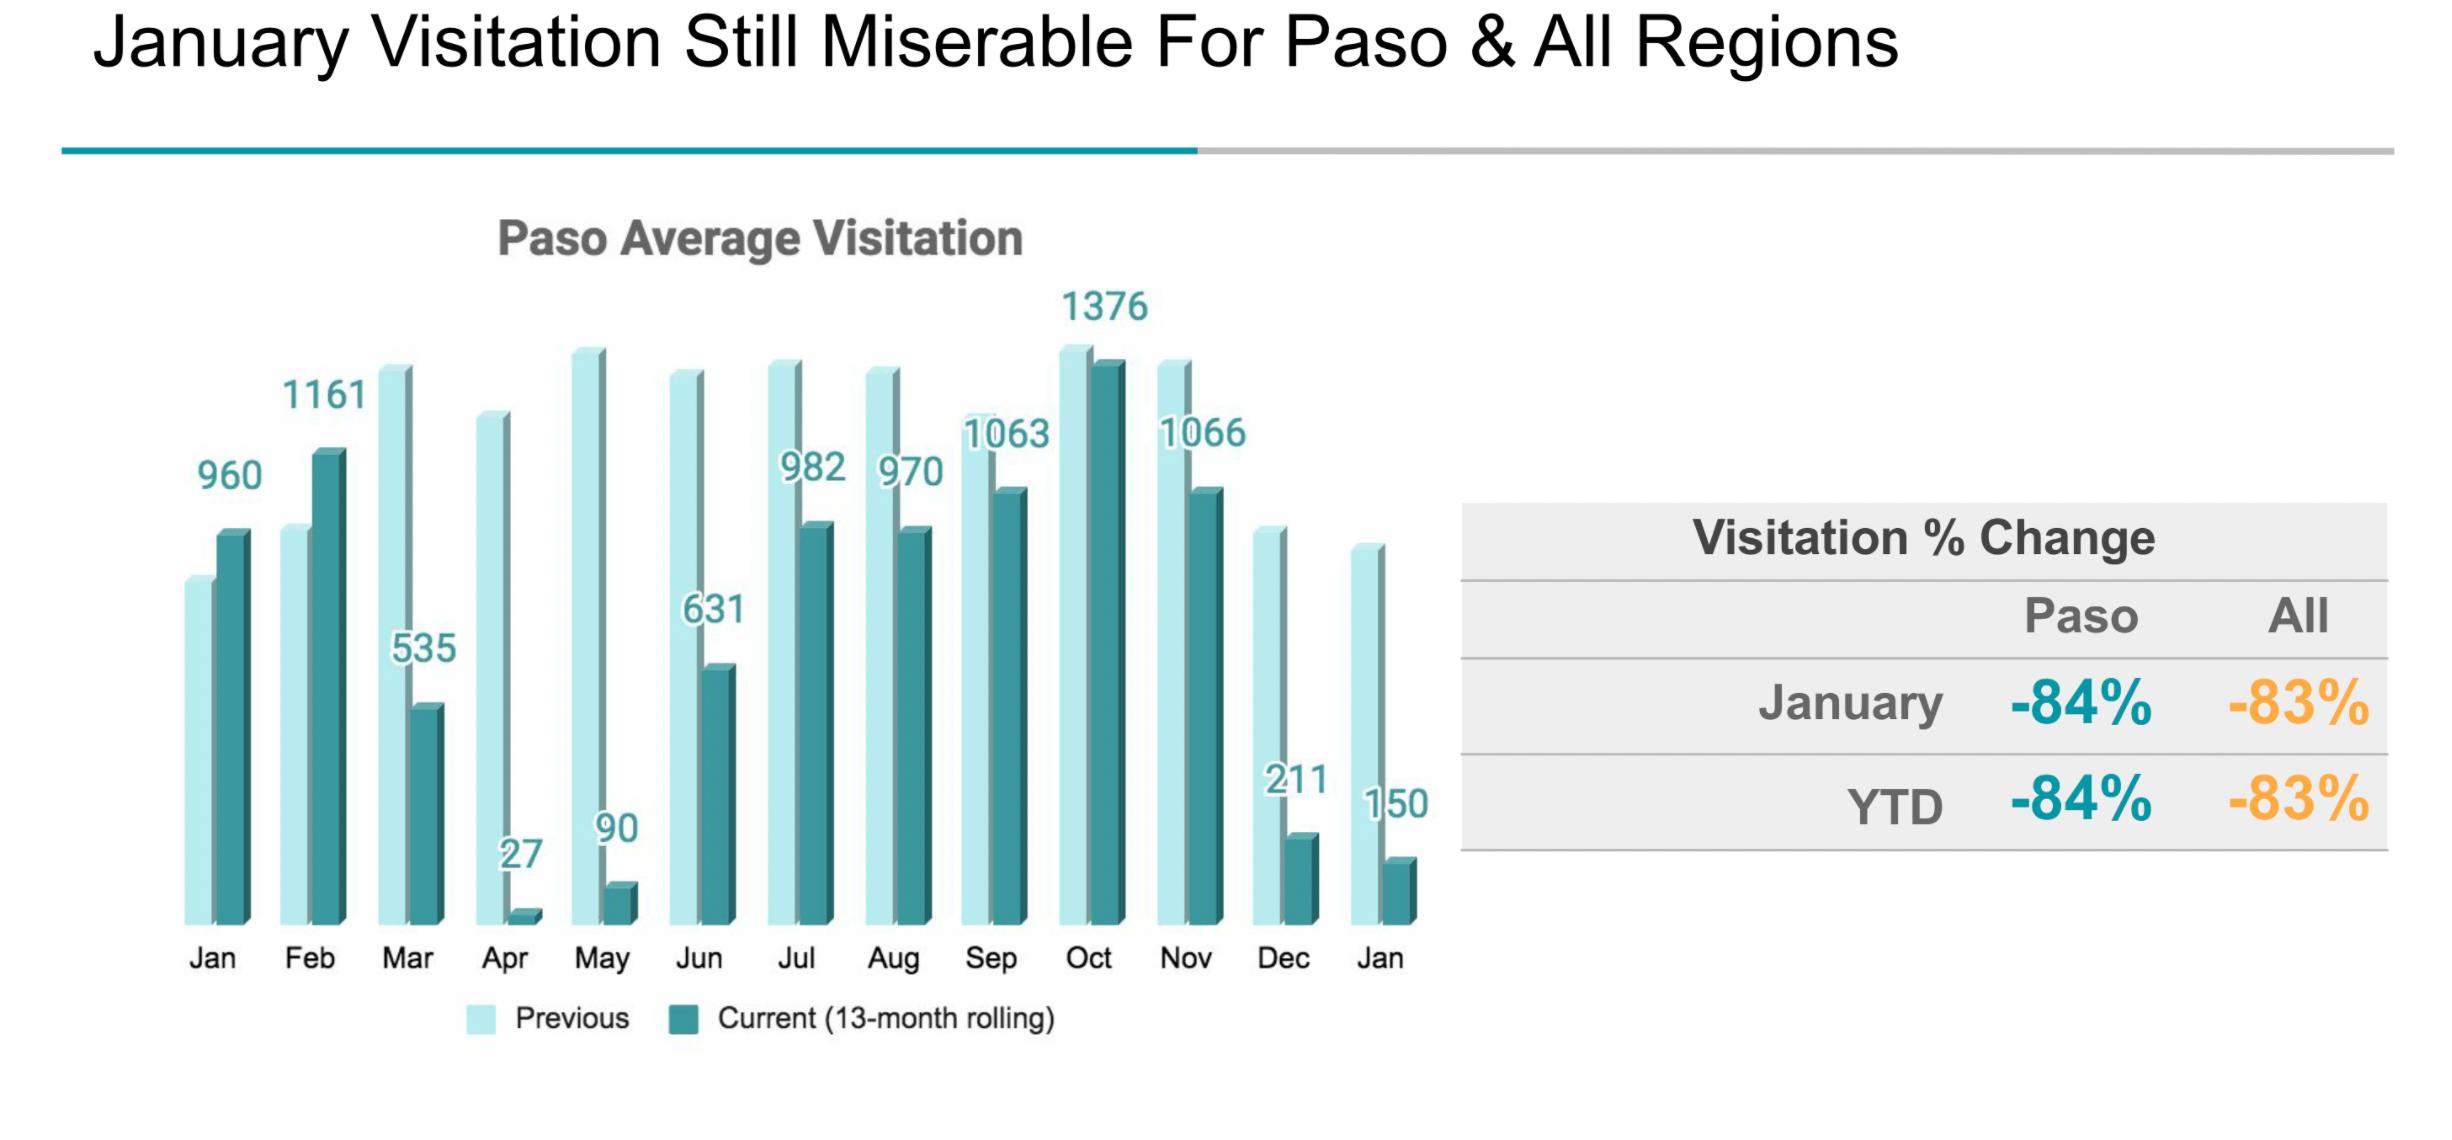 January 2021 Visitation miserable